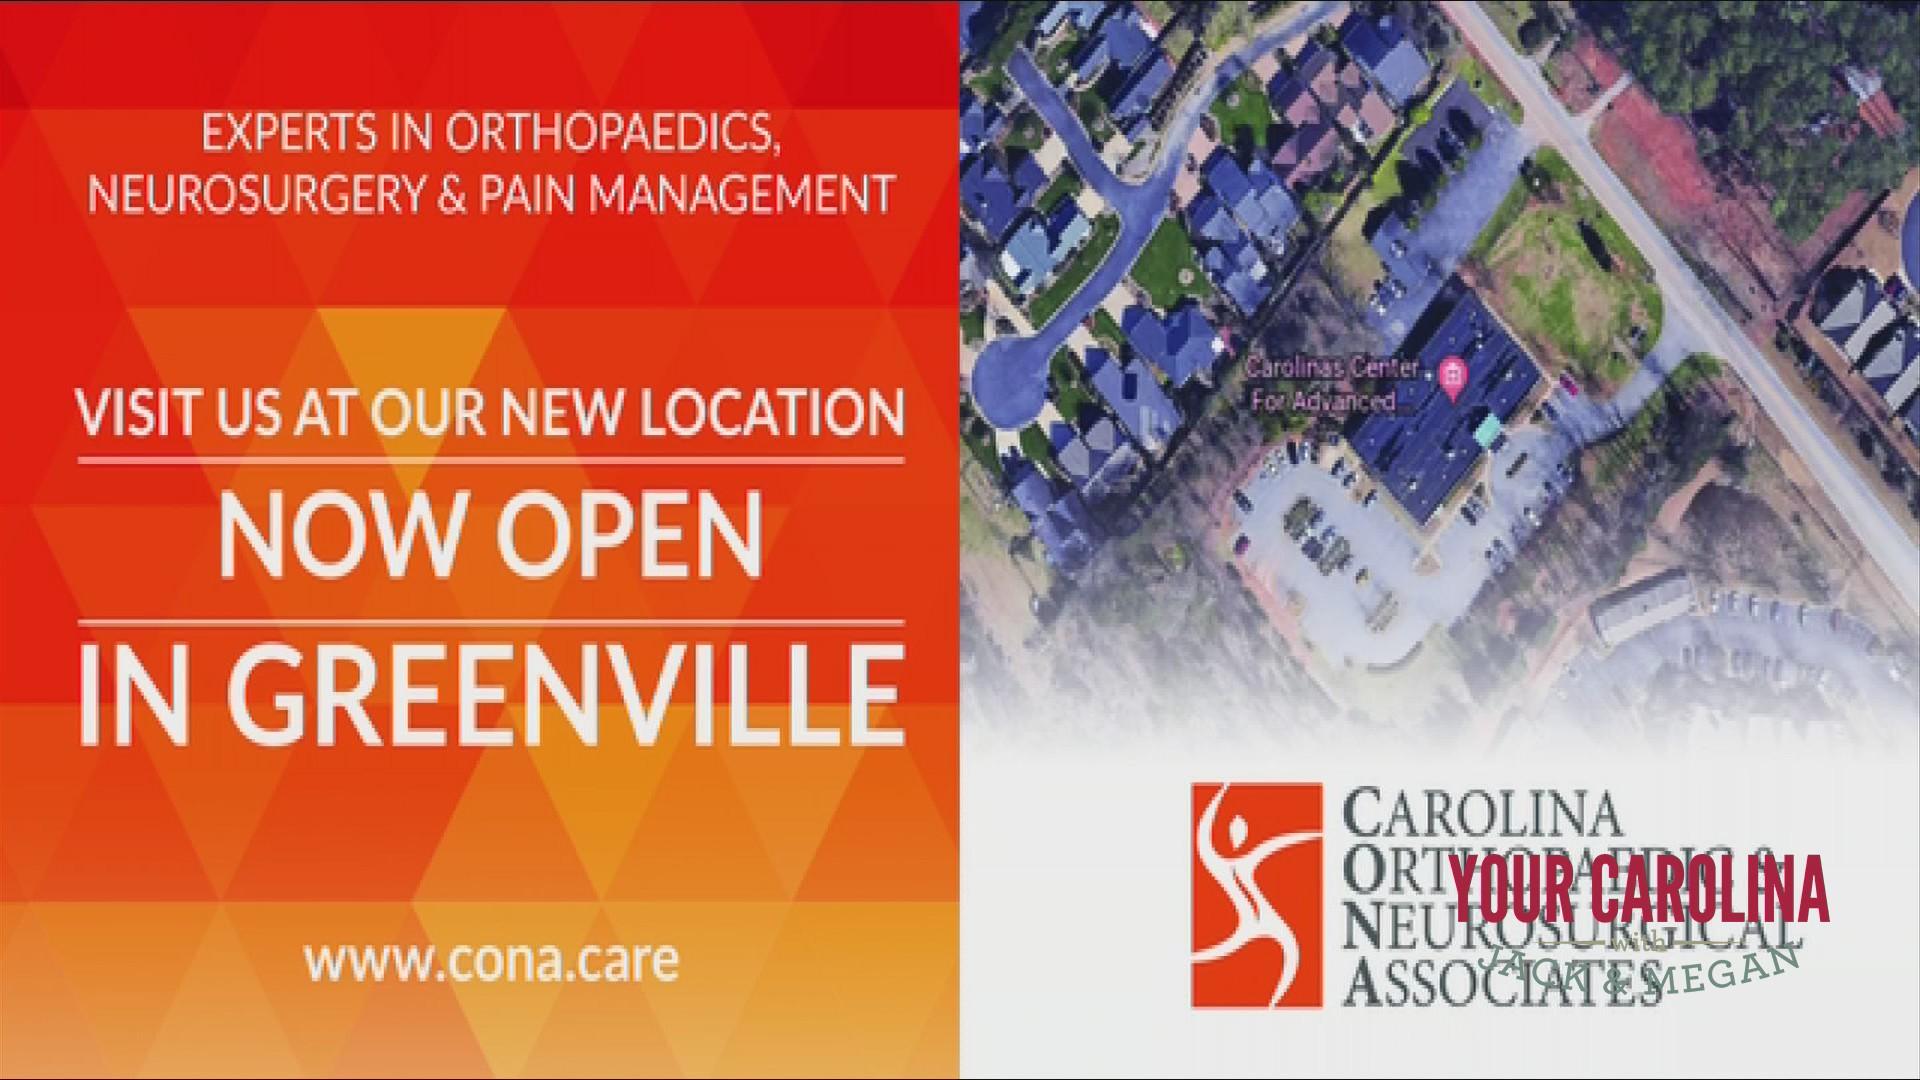 Carolina Orthopaedics & Neurosurgery Associates